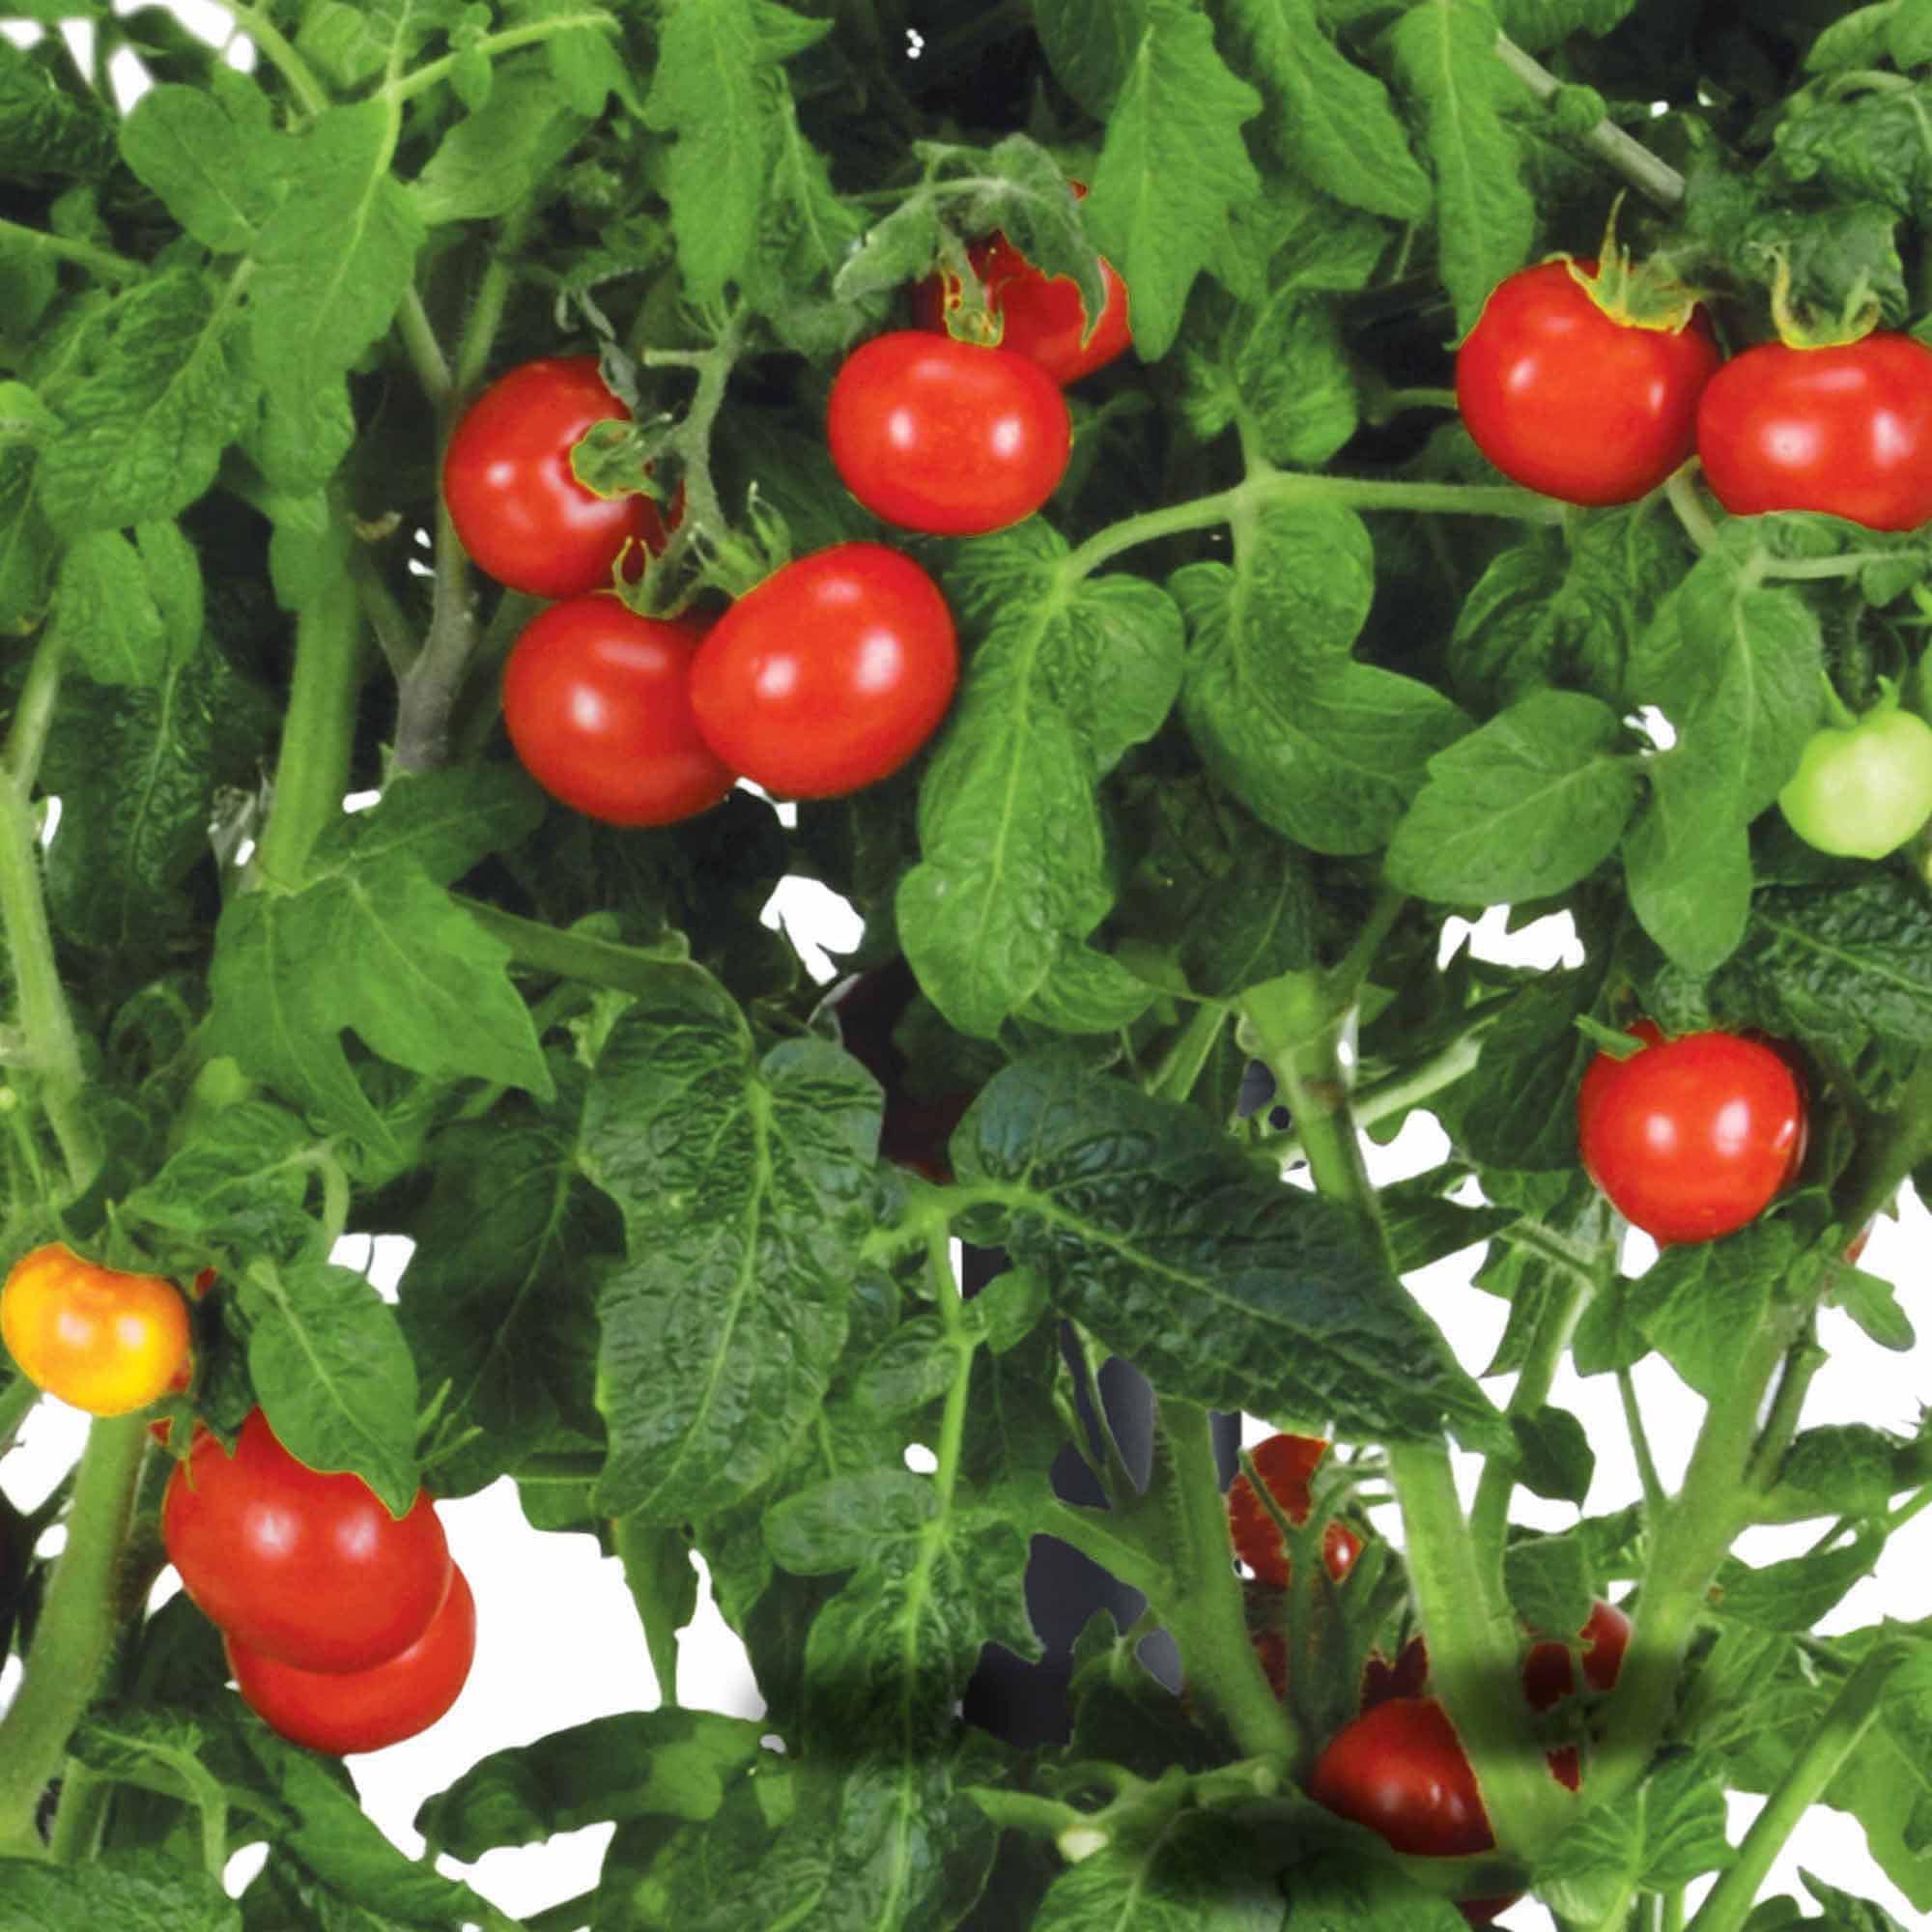 Miracle Gro AeroGarden Mega Cherry Tomato 7 Pod Seed Kit Walmartcom